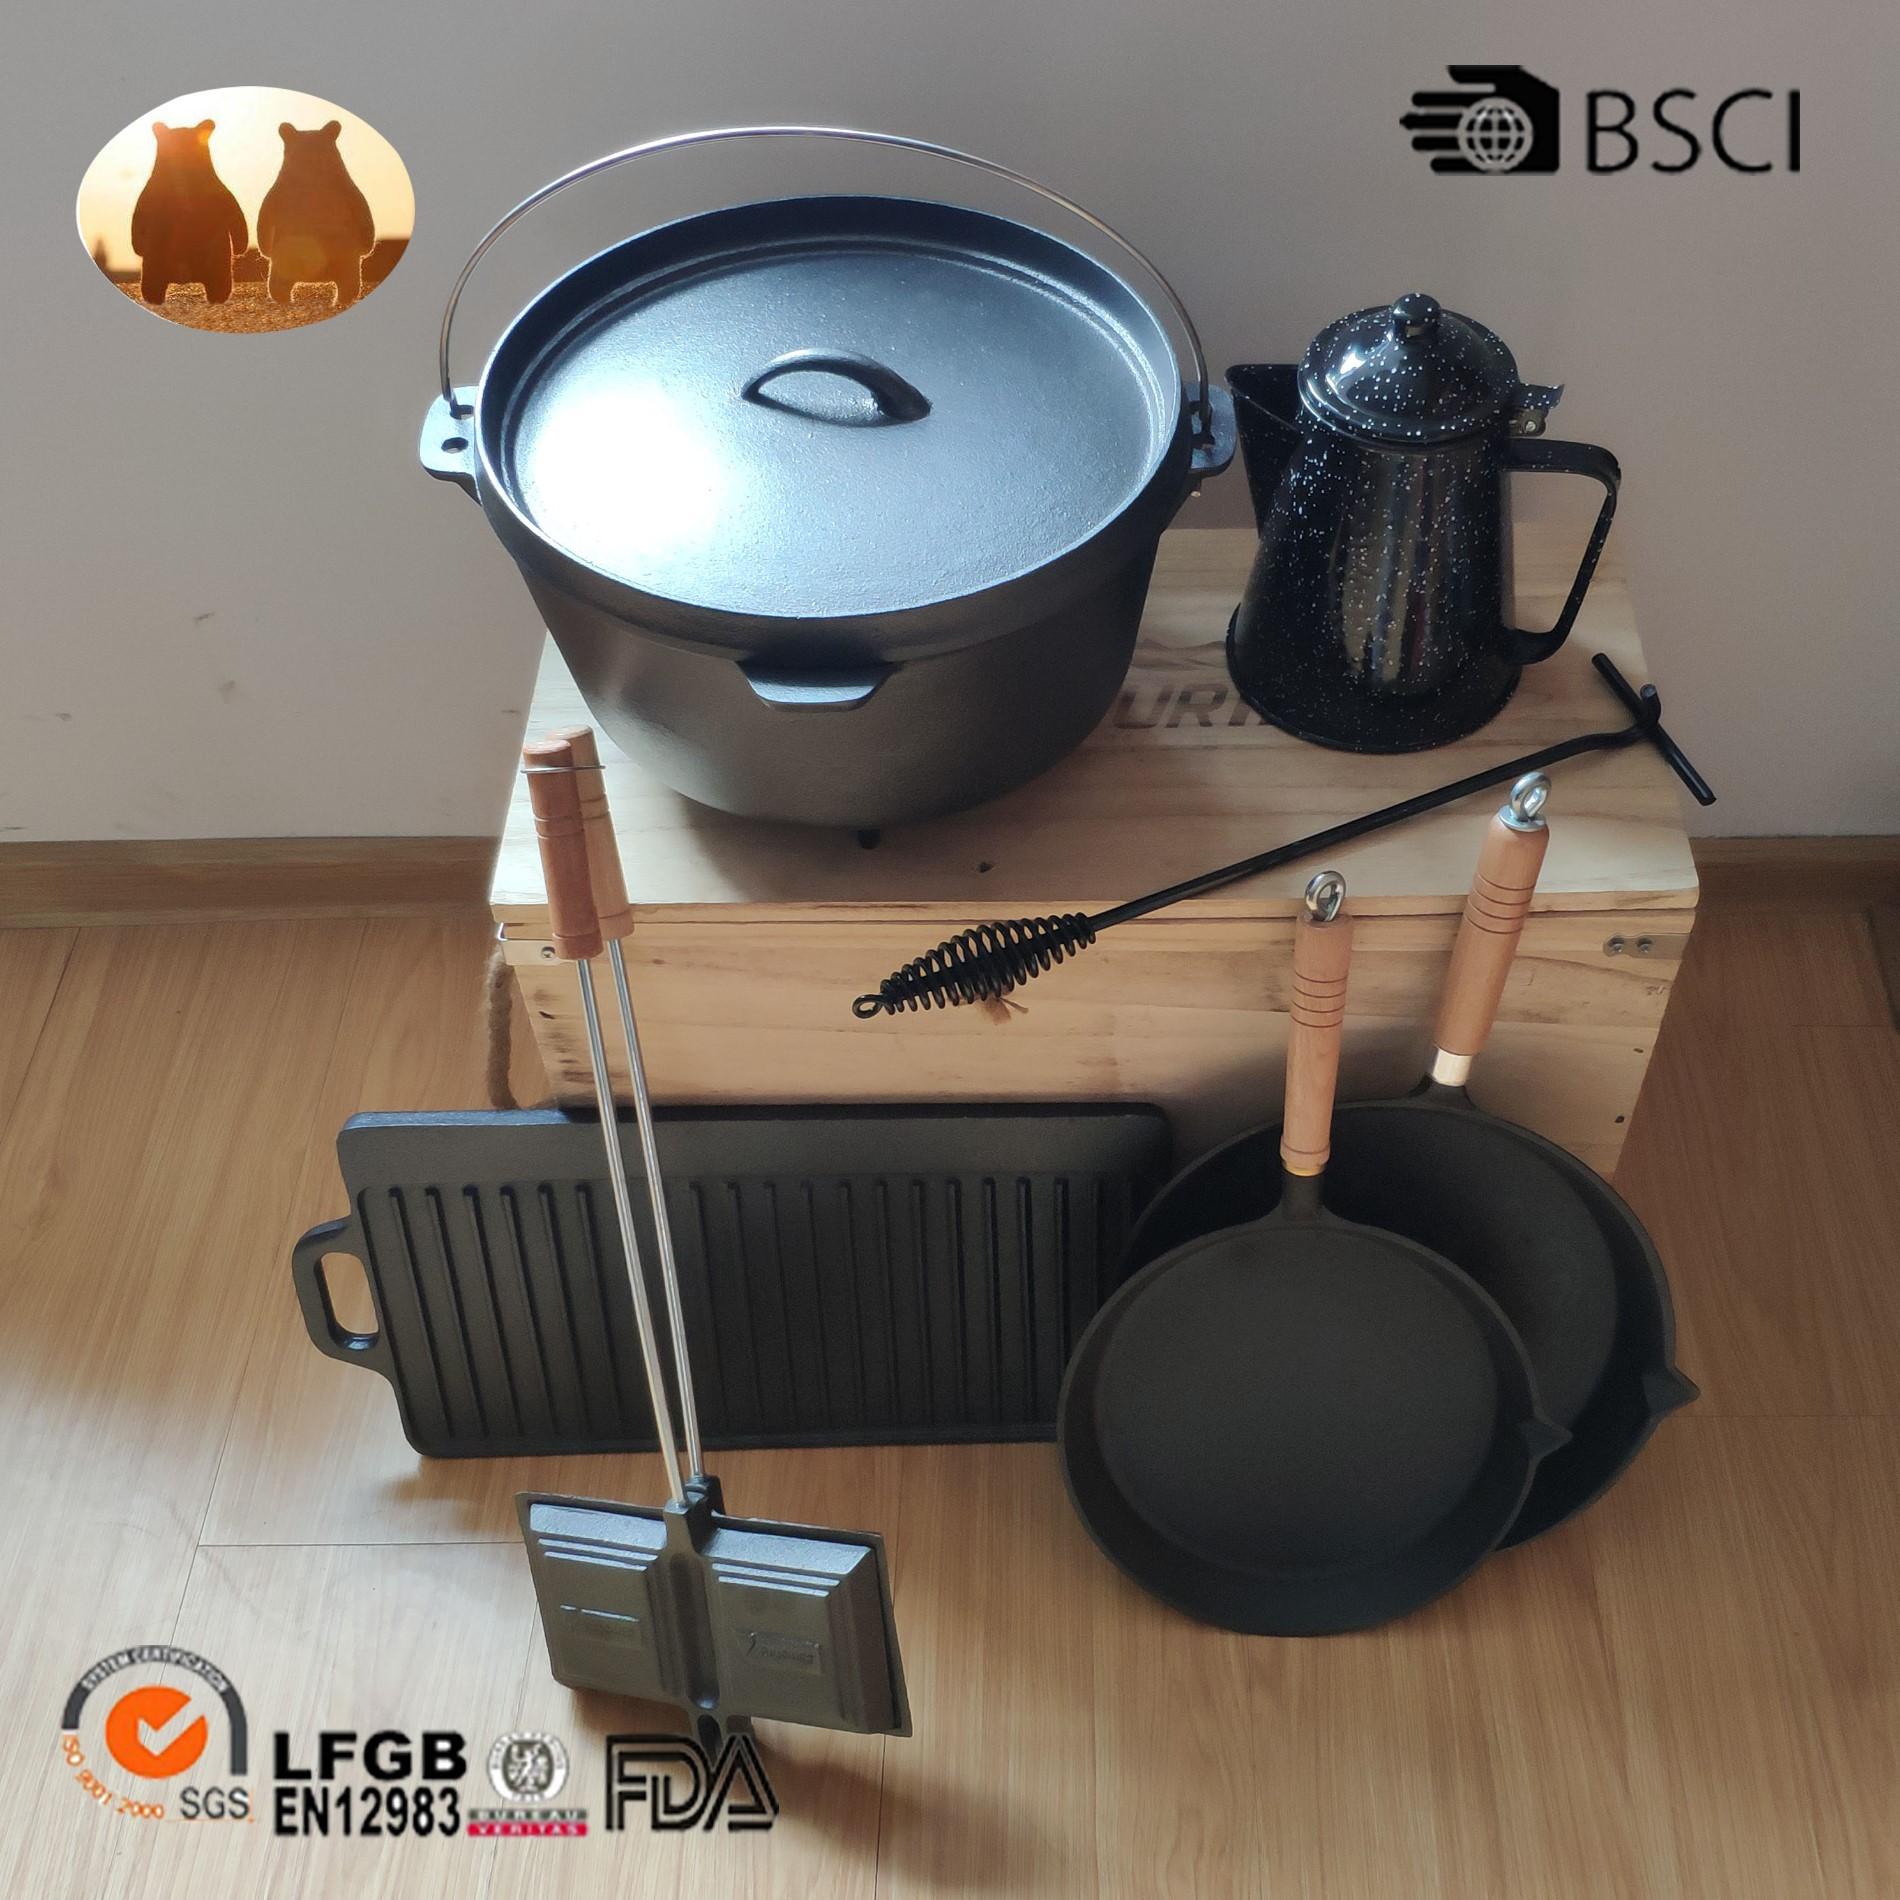 Cast Iron Camping Cookware Manufacturers, Cast Iron Camping Cookware Factory, Supply Cast Iron Camping Cookware